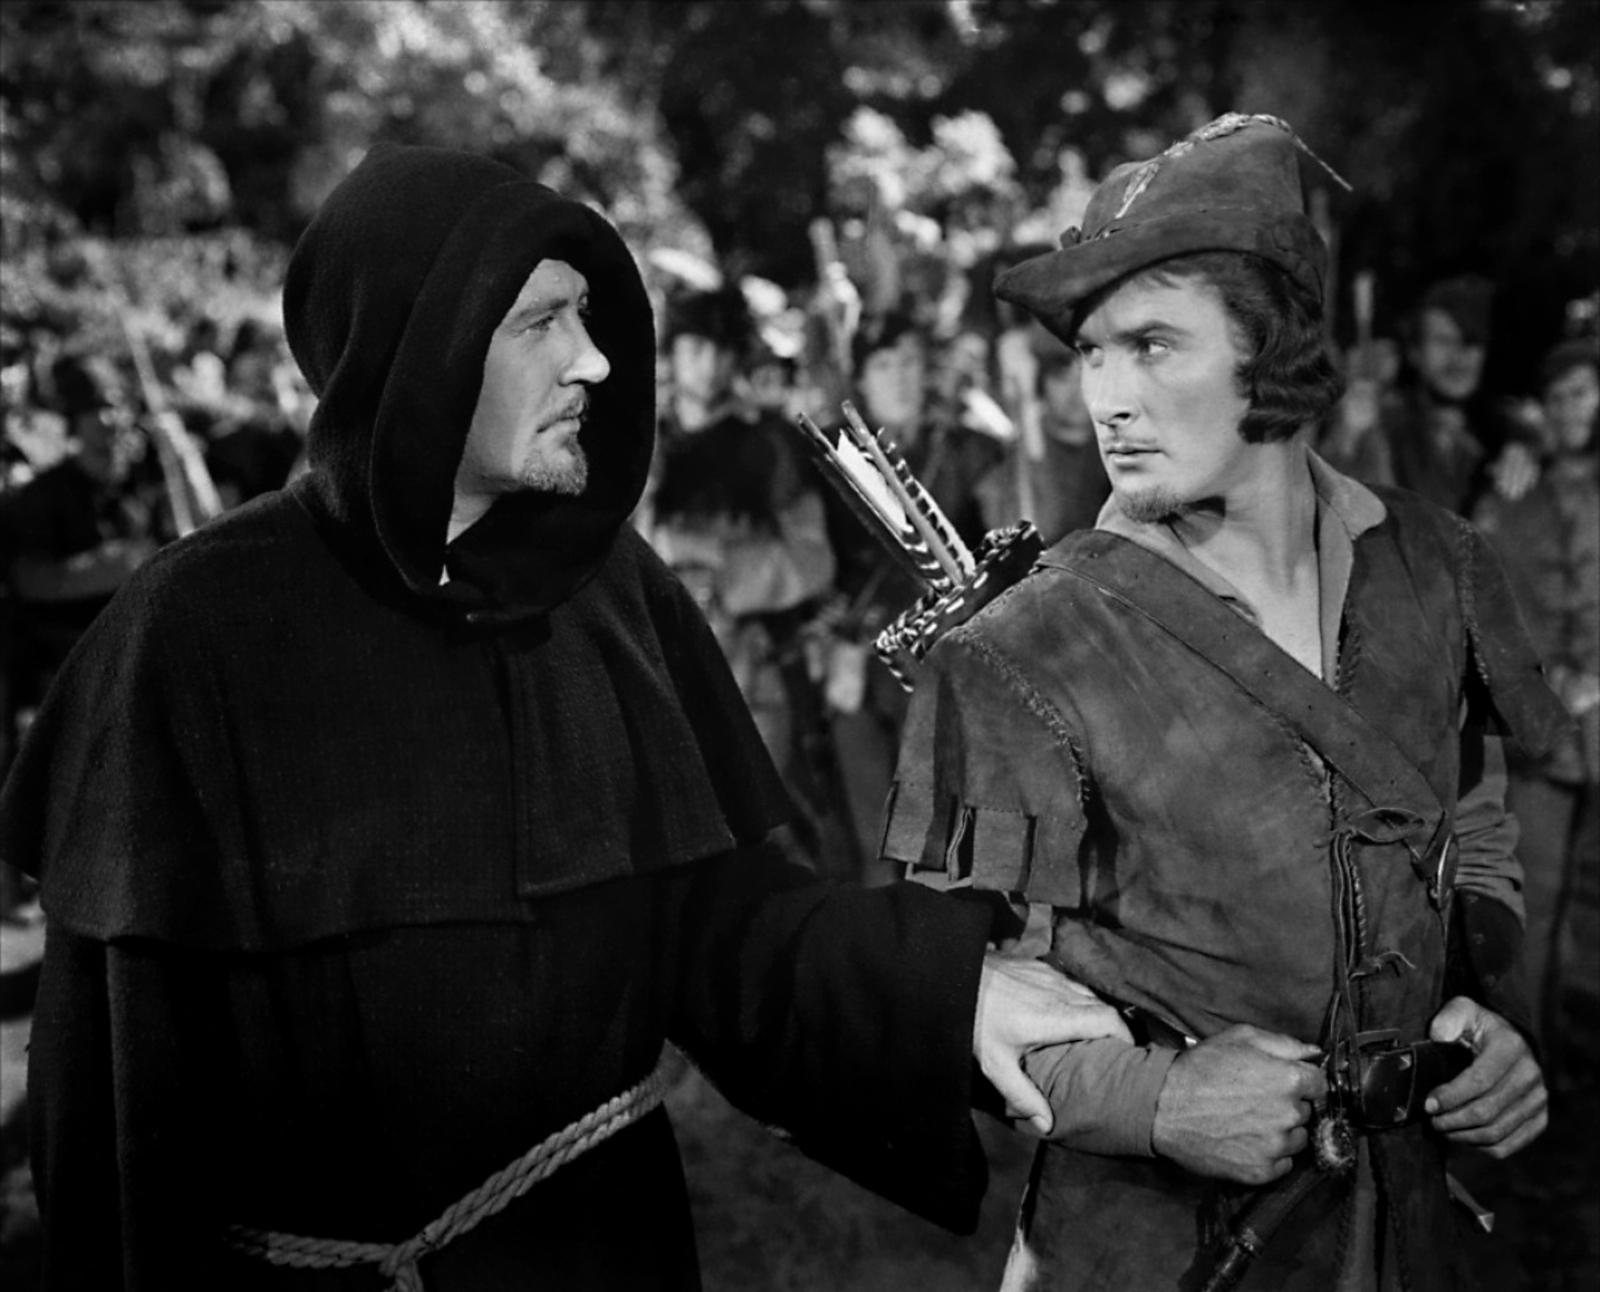 Errol Flynn with Ian Hunter